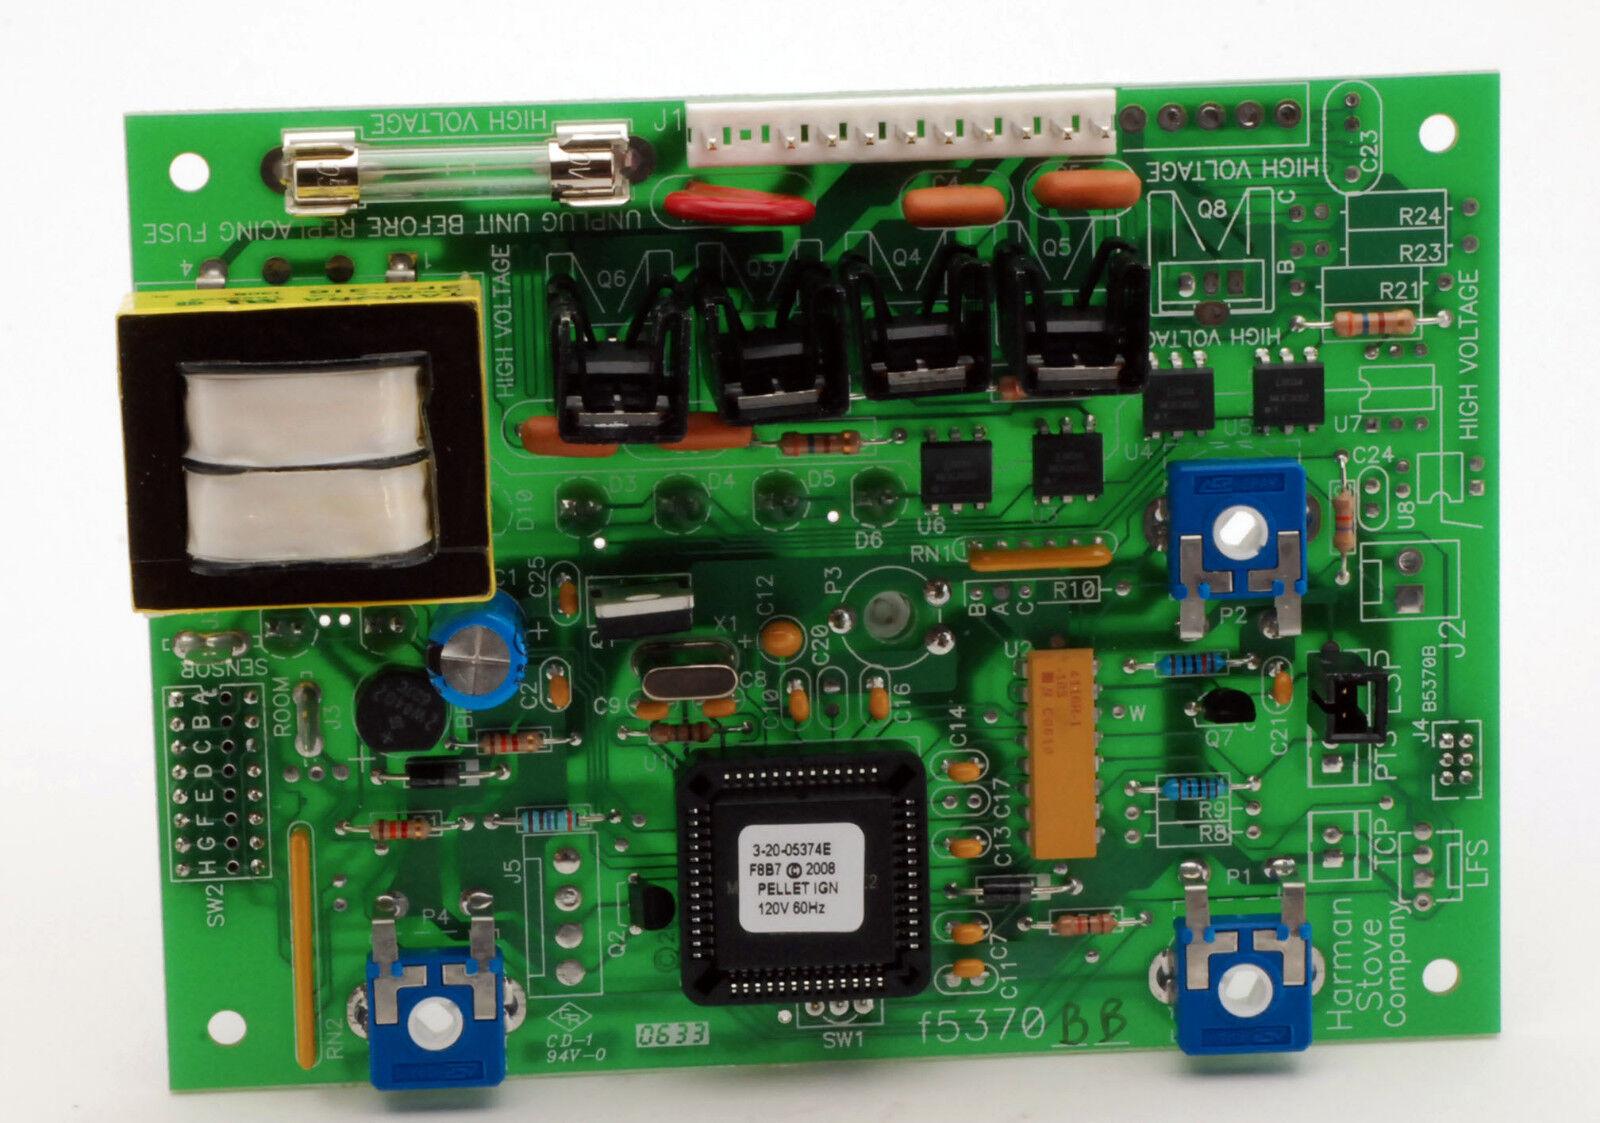 Harman, Harmon Pellet Estufa placa de circuito de control de platino 52I, P68 + 1-00-05886